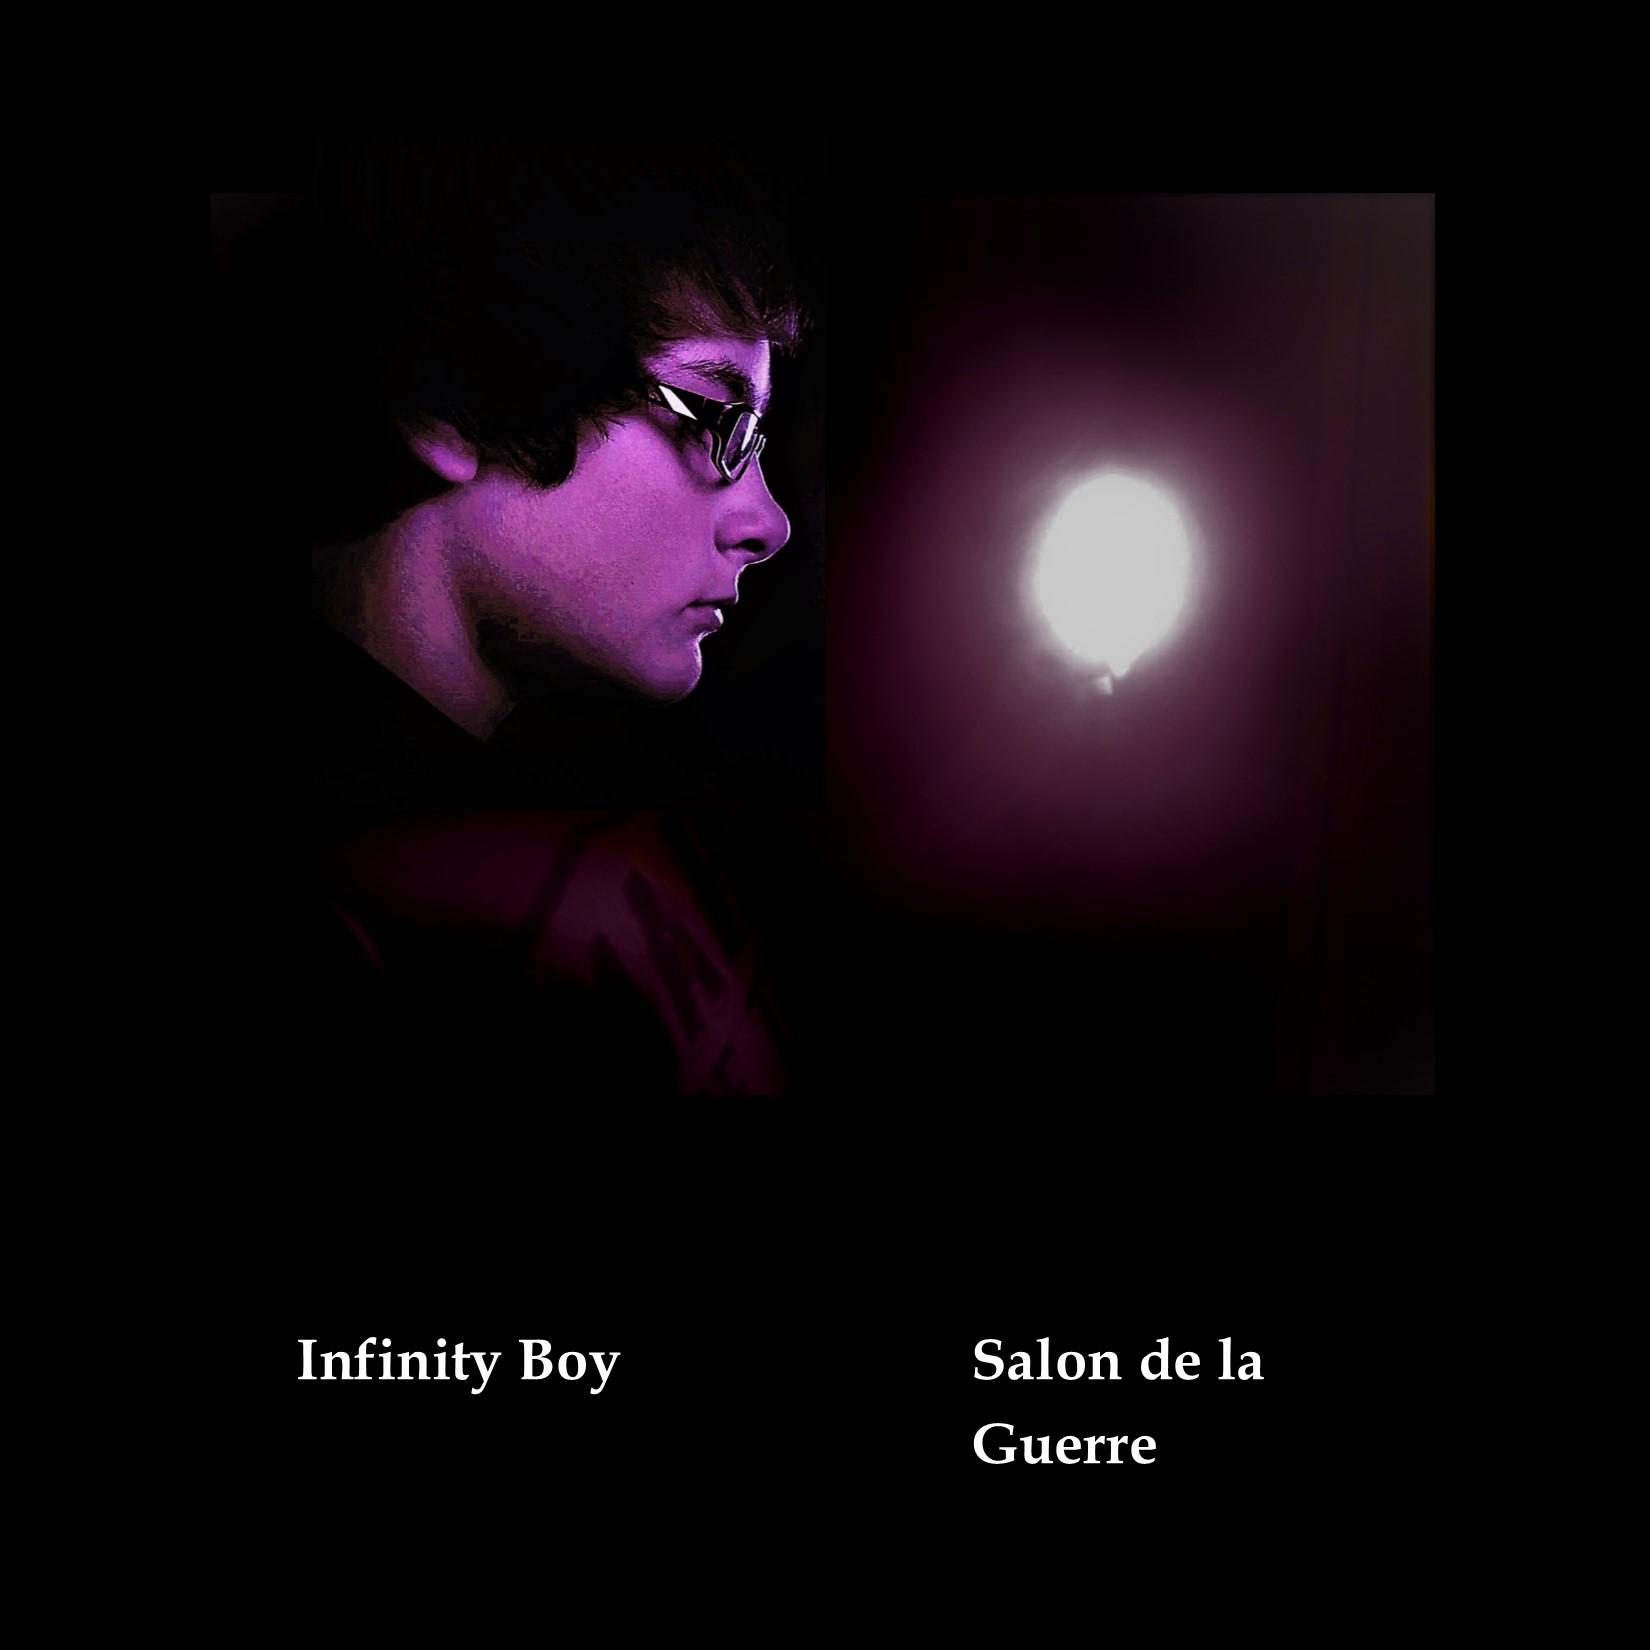 Infinity Boy